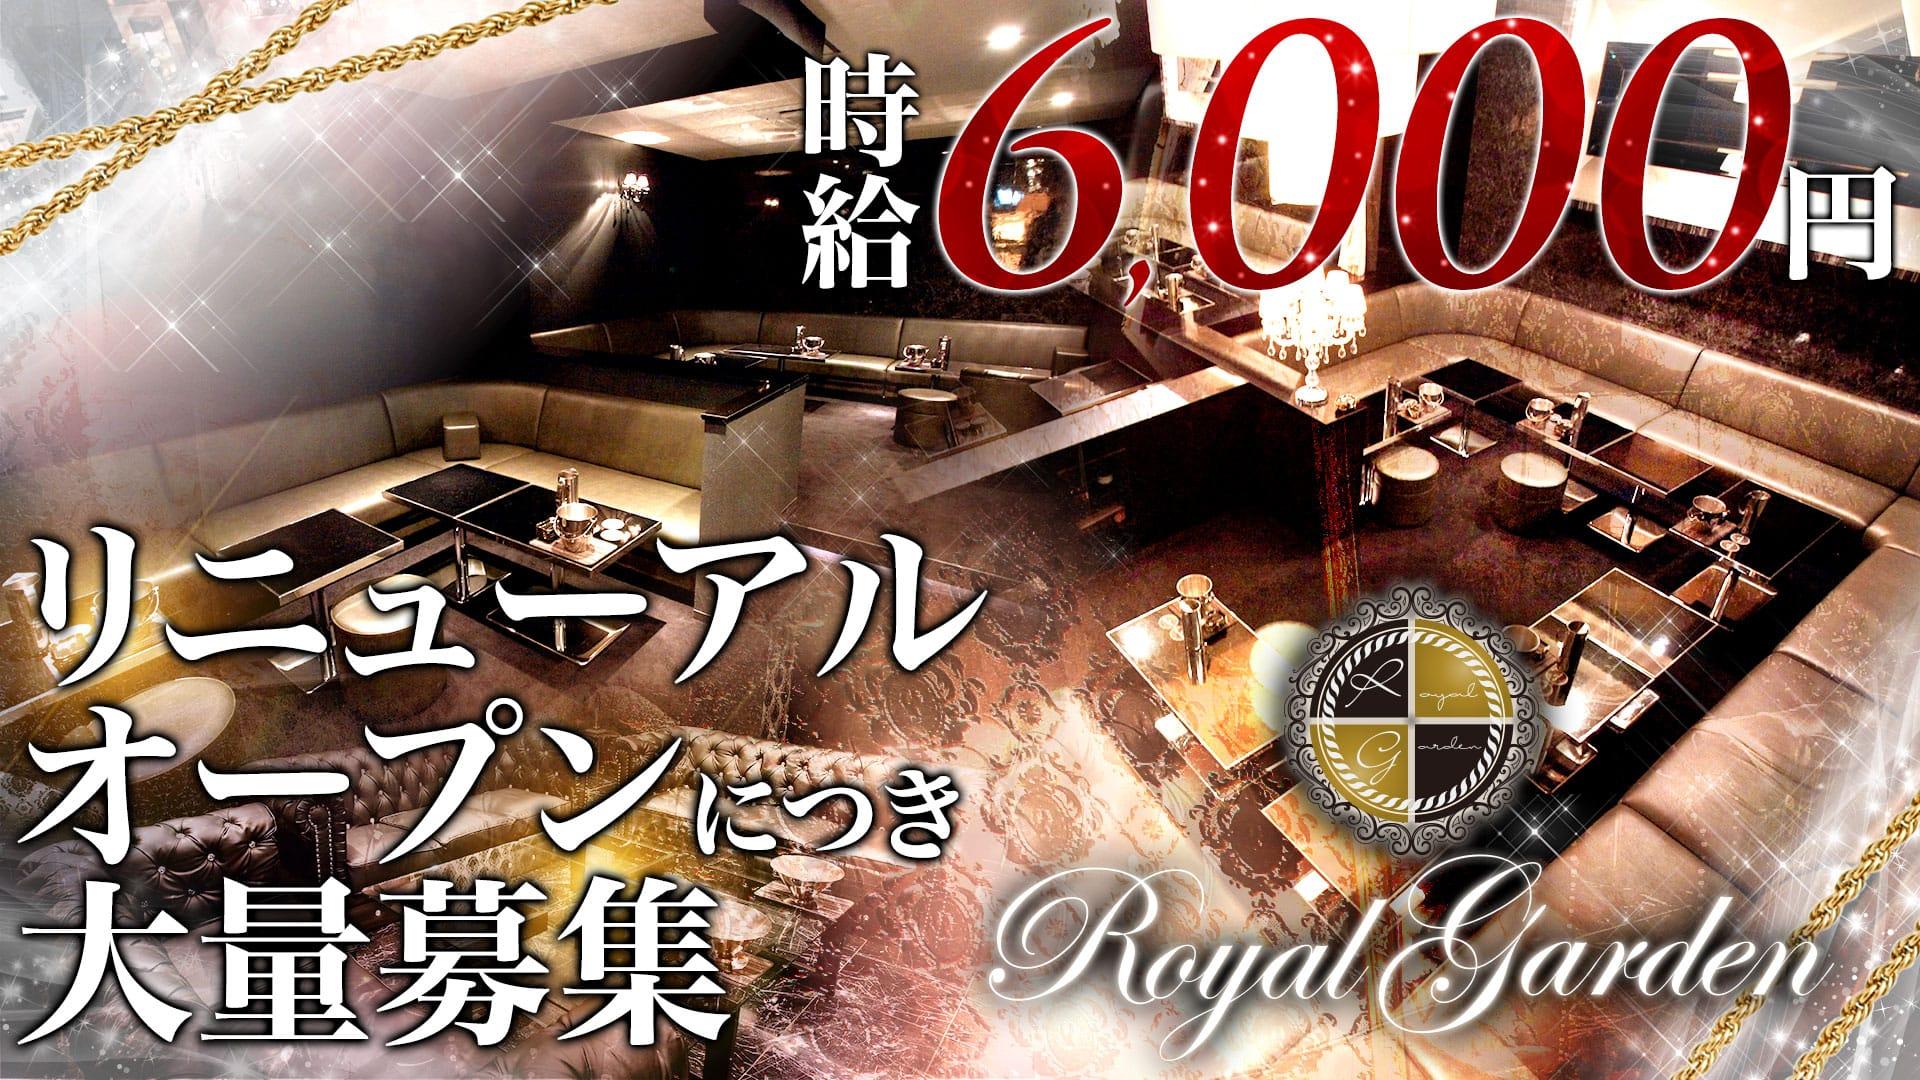 ROYAL GARDEN~ロイヤルガーデン~ 関内キャバクラ TOP画像